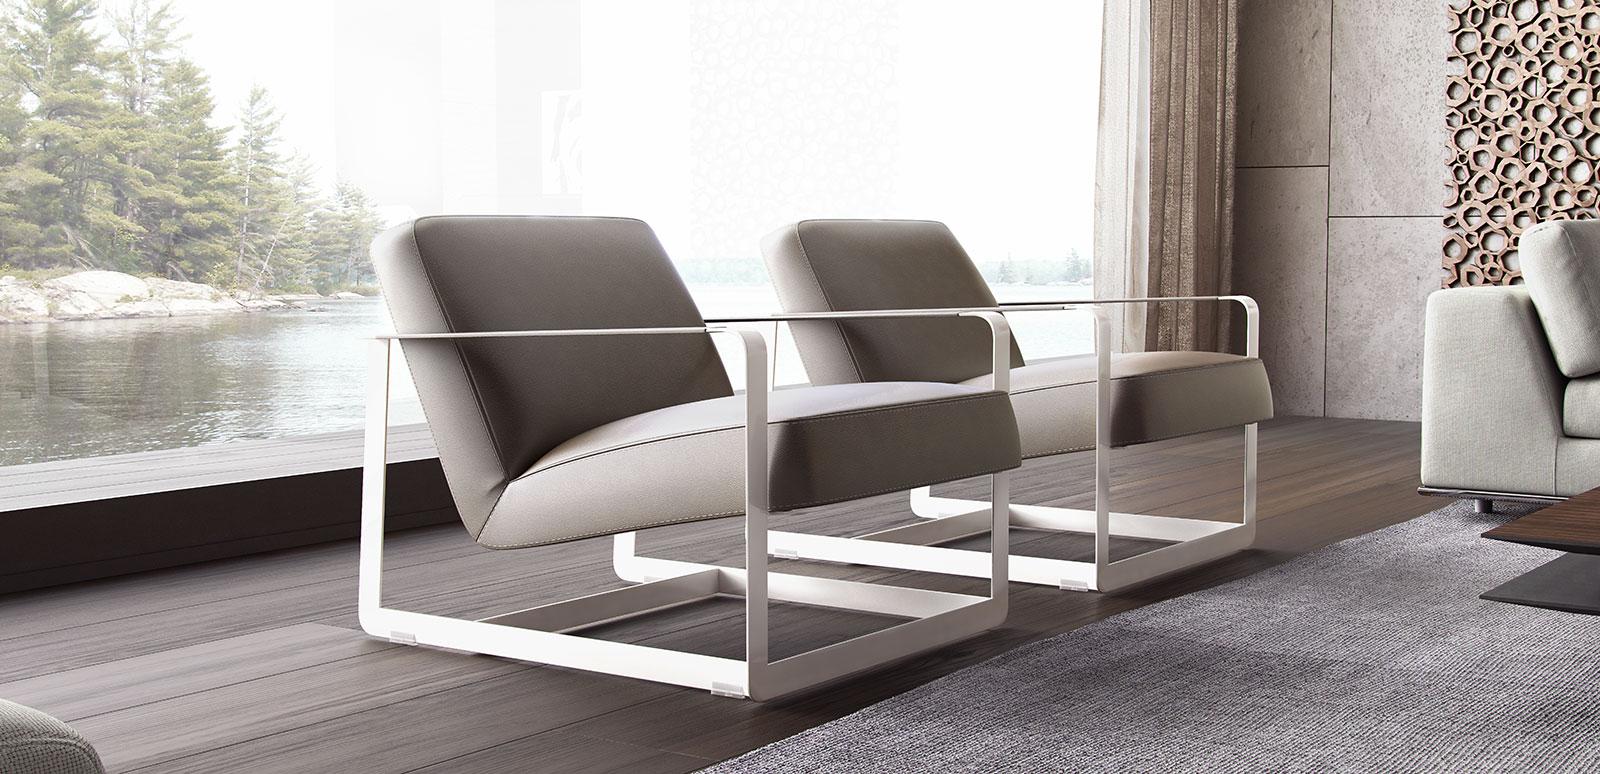 Terrific Crosby Lounge Chair Castle Gray By Modloft Machost Co Dining Chair Design Ideas Machostcouk